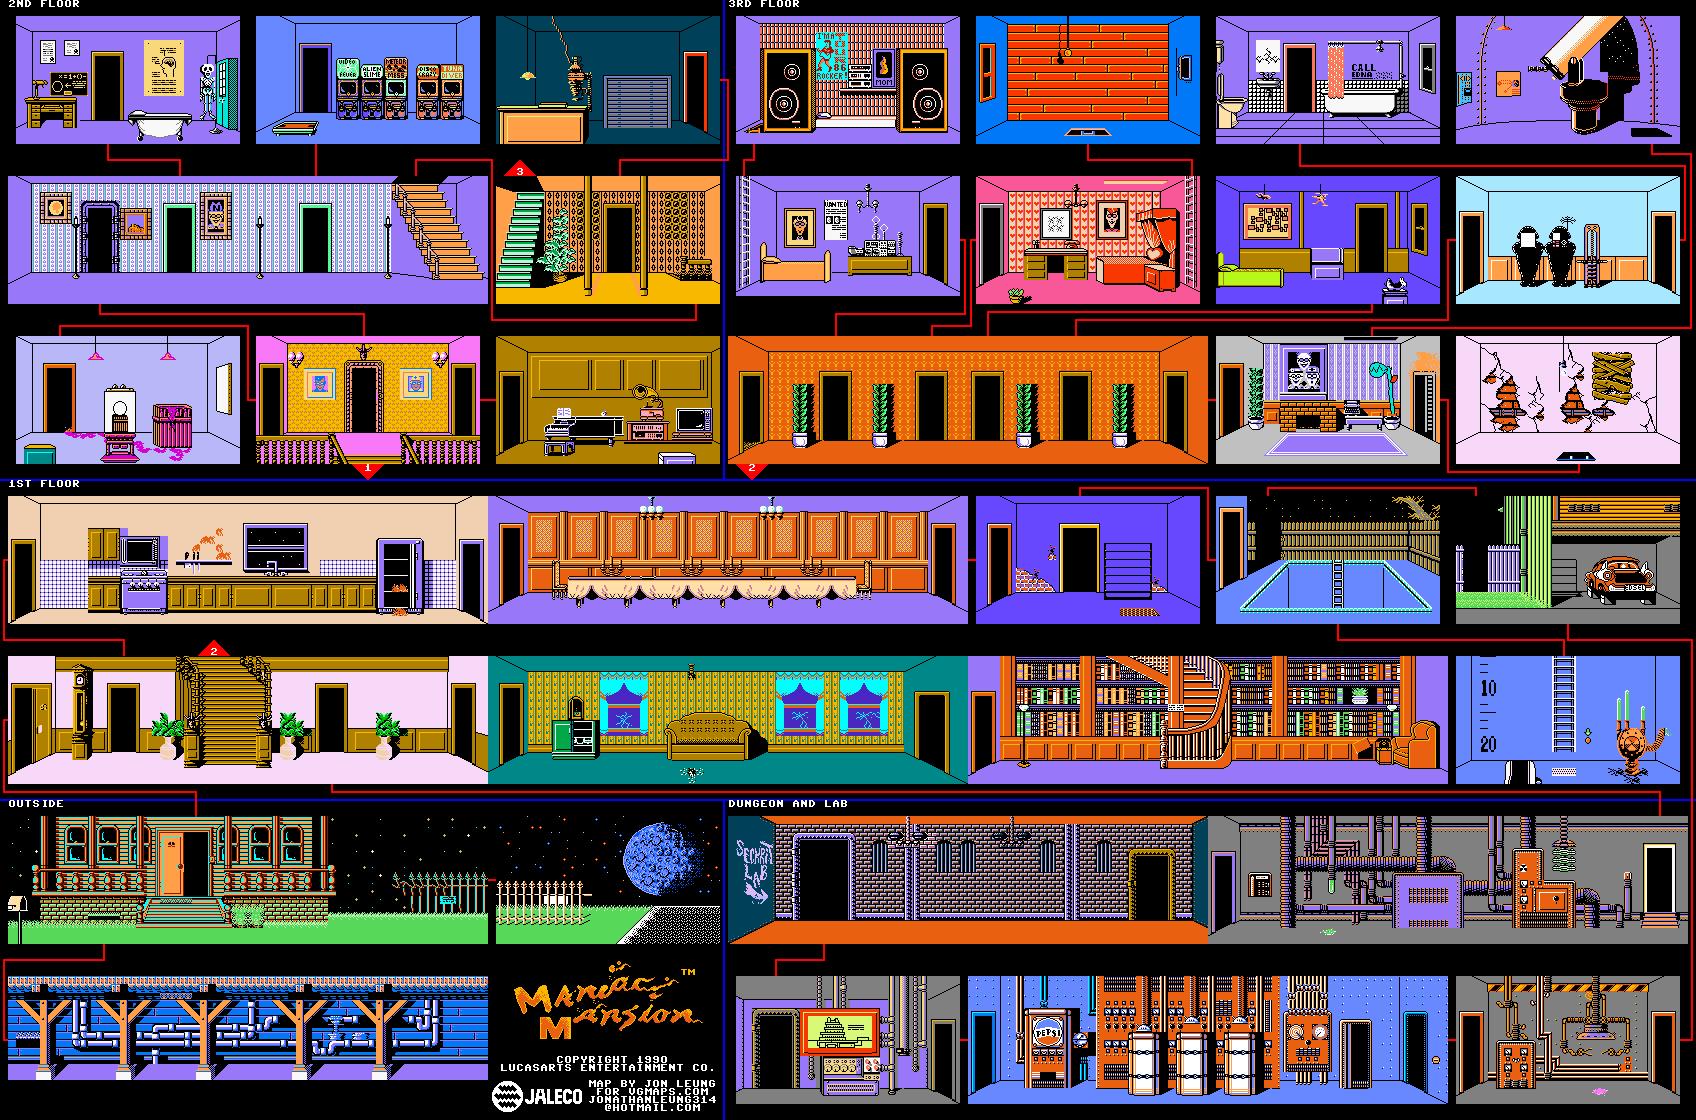 Maniac Mansion game map (NES)